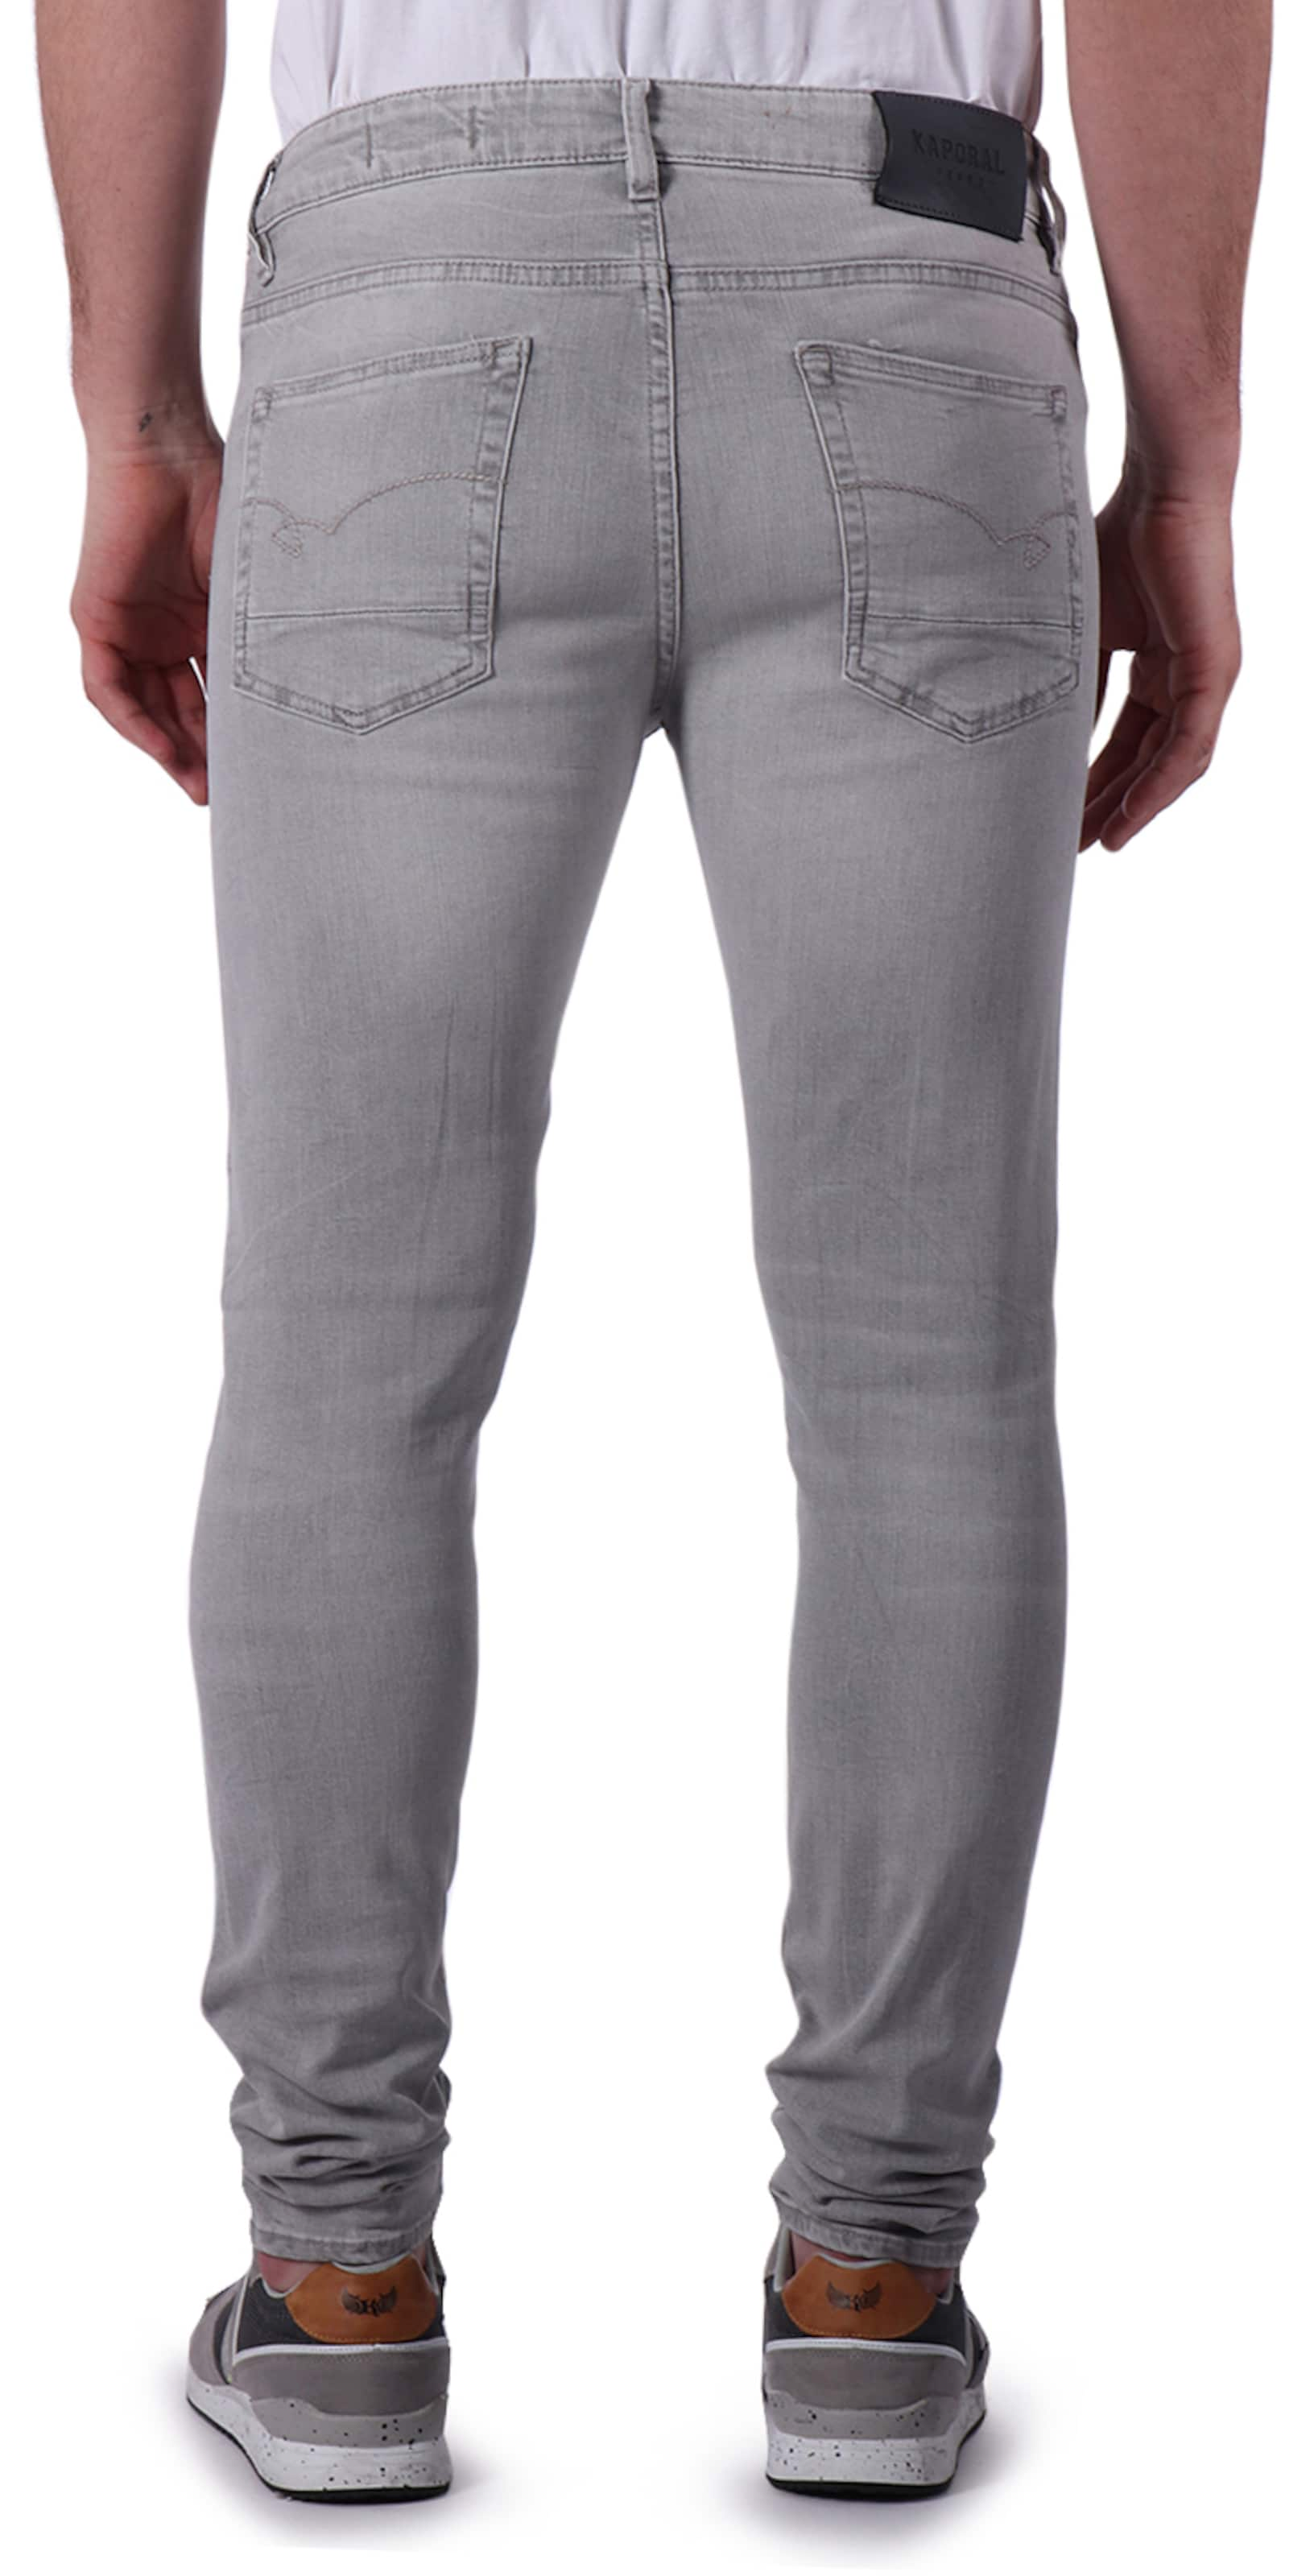 Jeans Grey Denim In Kaporal 'dadas' f7bgy6